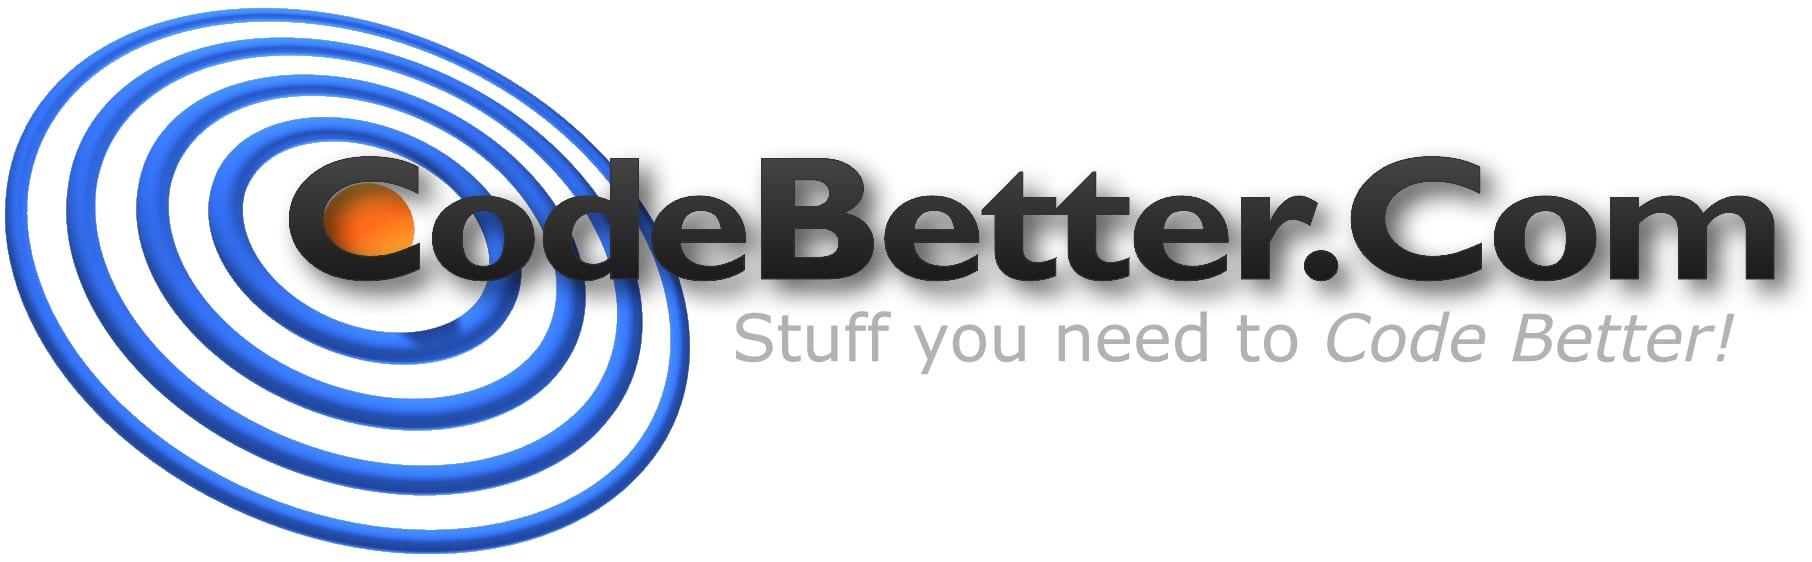 CodeBetter.Com - Crunchbase Company Profile & Funding